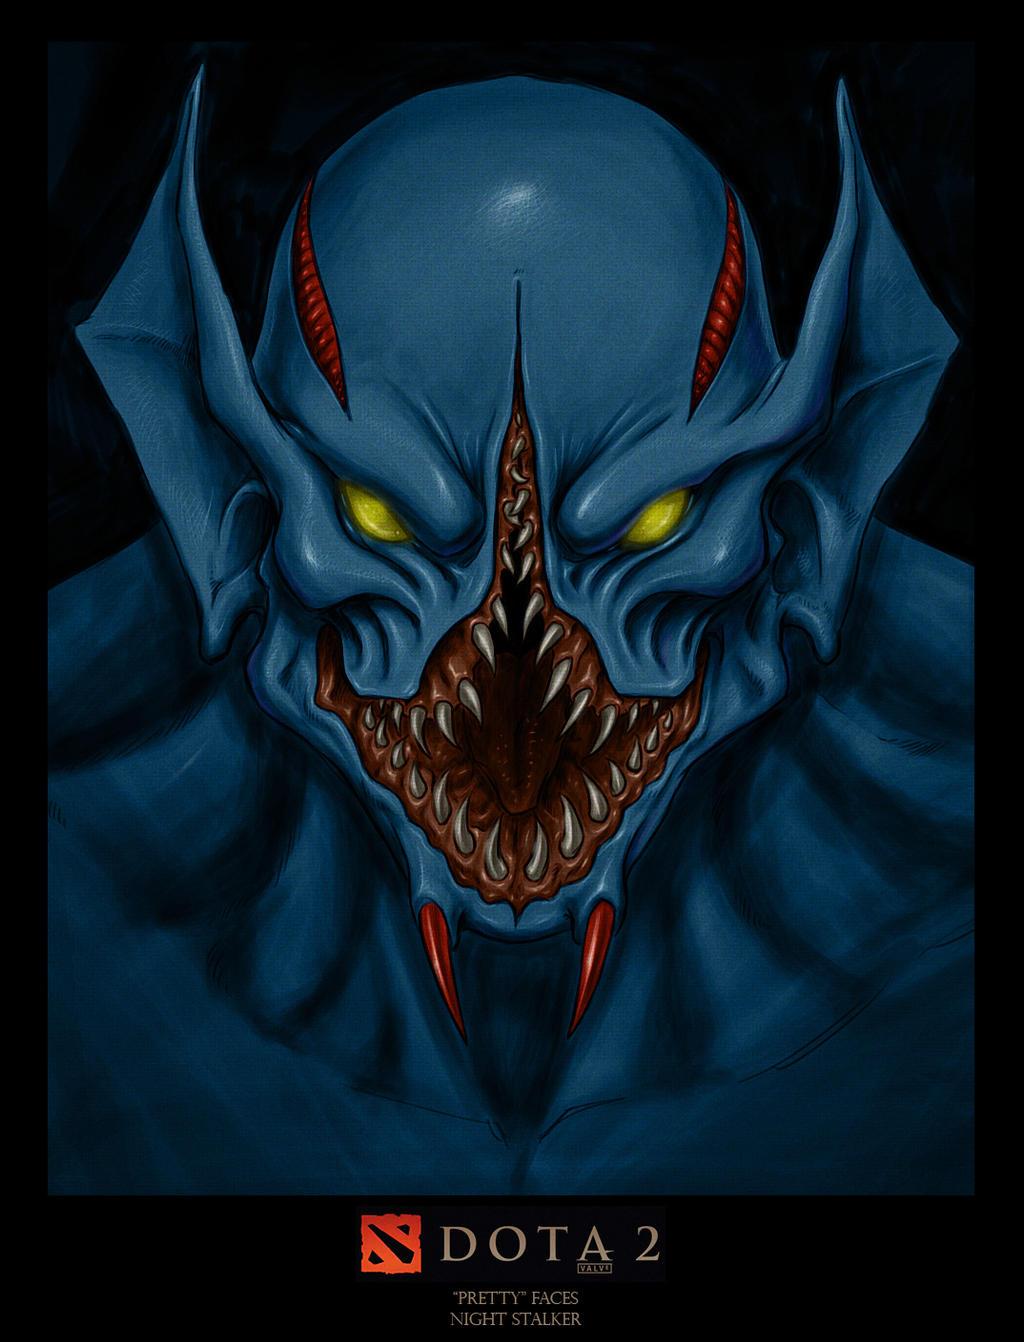 dota2 pretty faces nightstalker by hybridos on deviantart